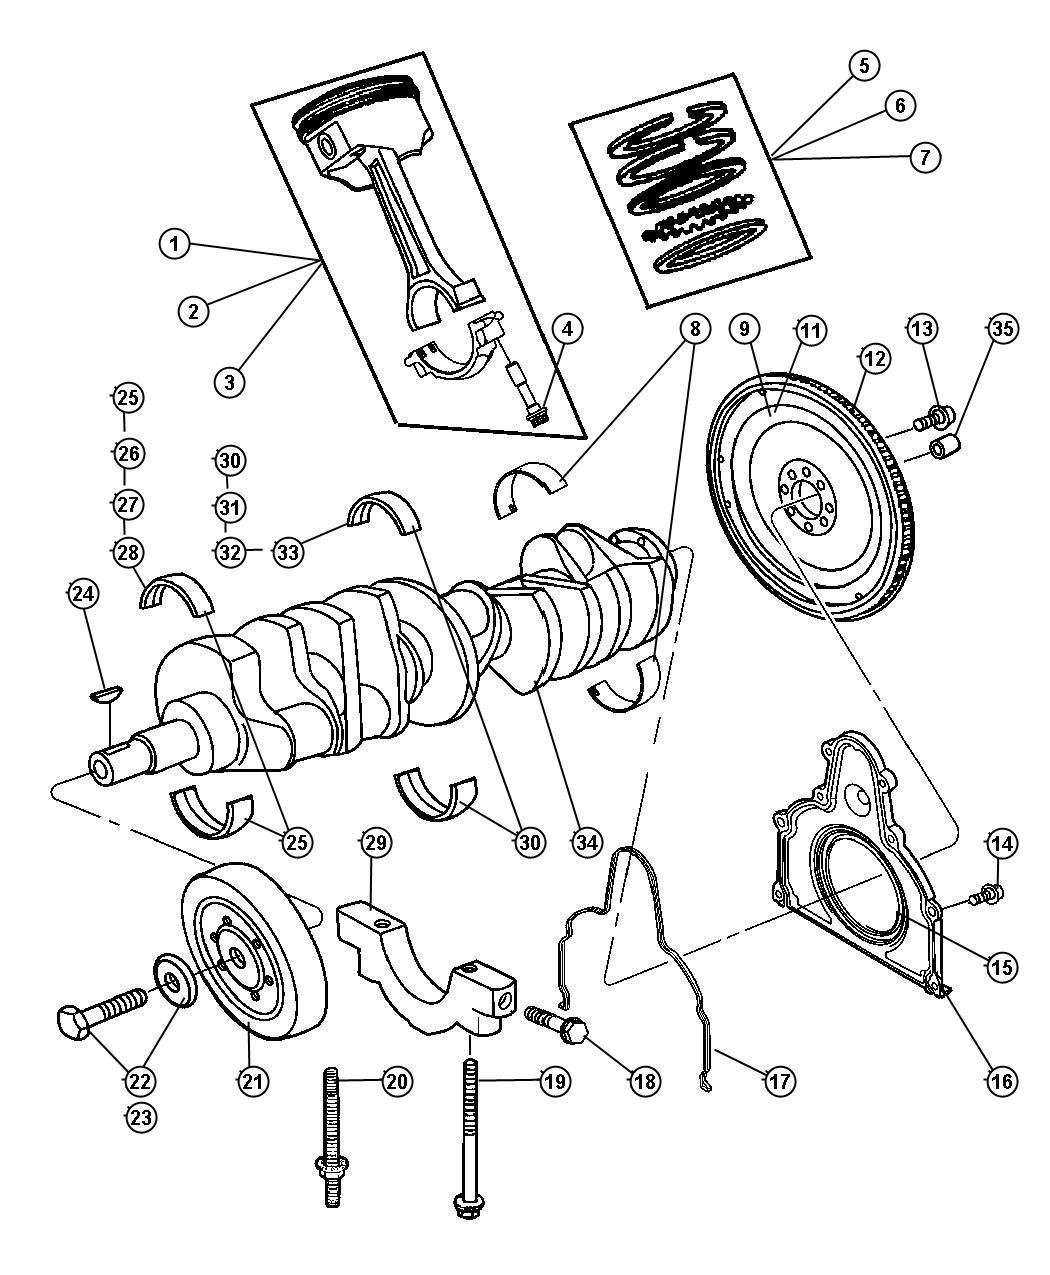 Dodge Ram Bolt Connecting Rod Mj9x1 00 4h Mj9 X